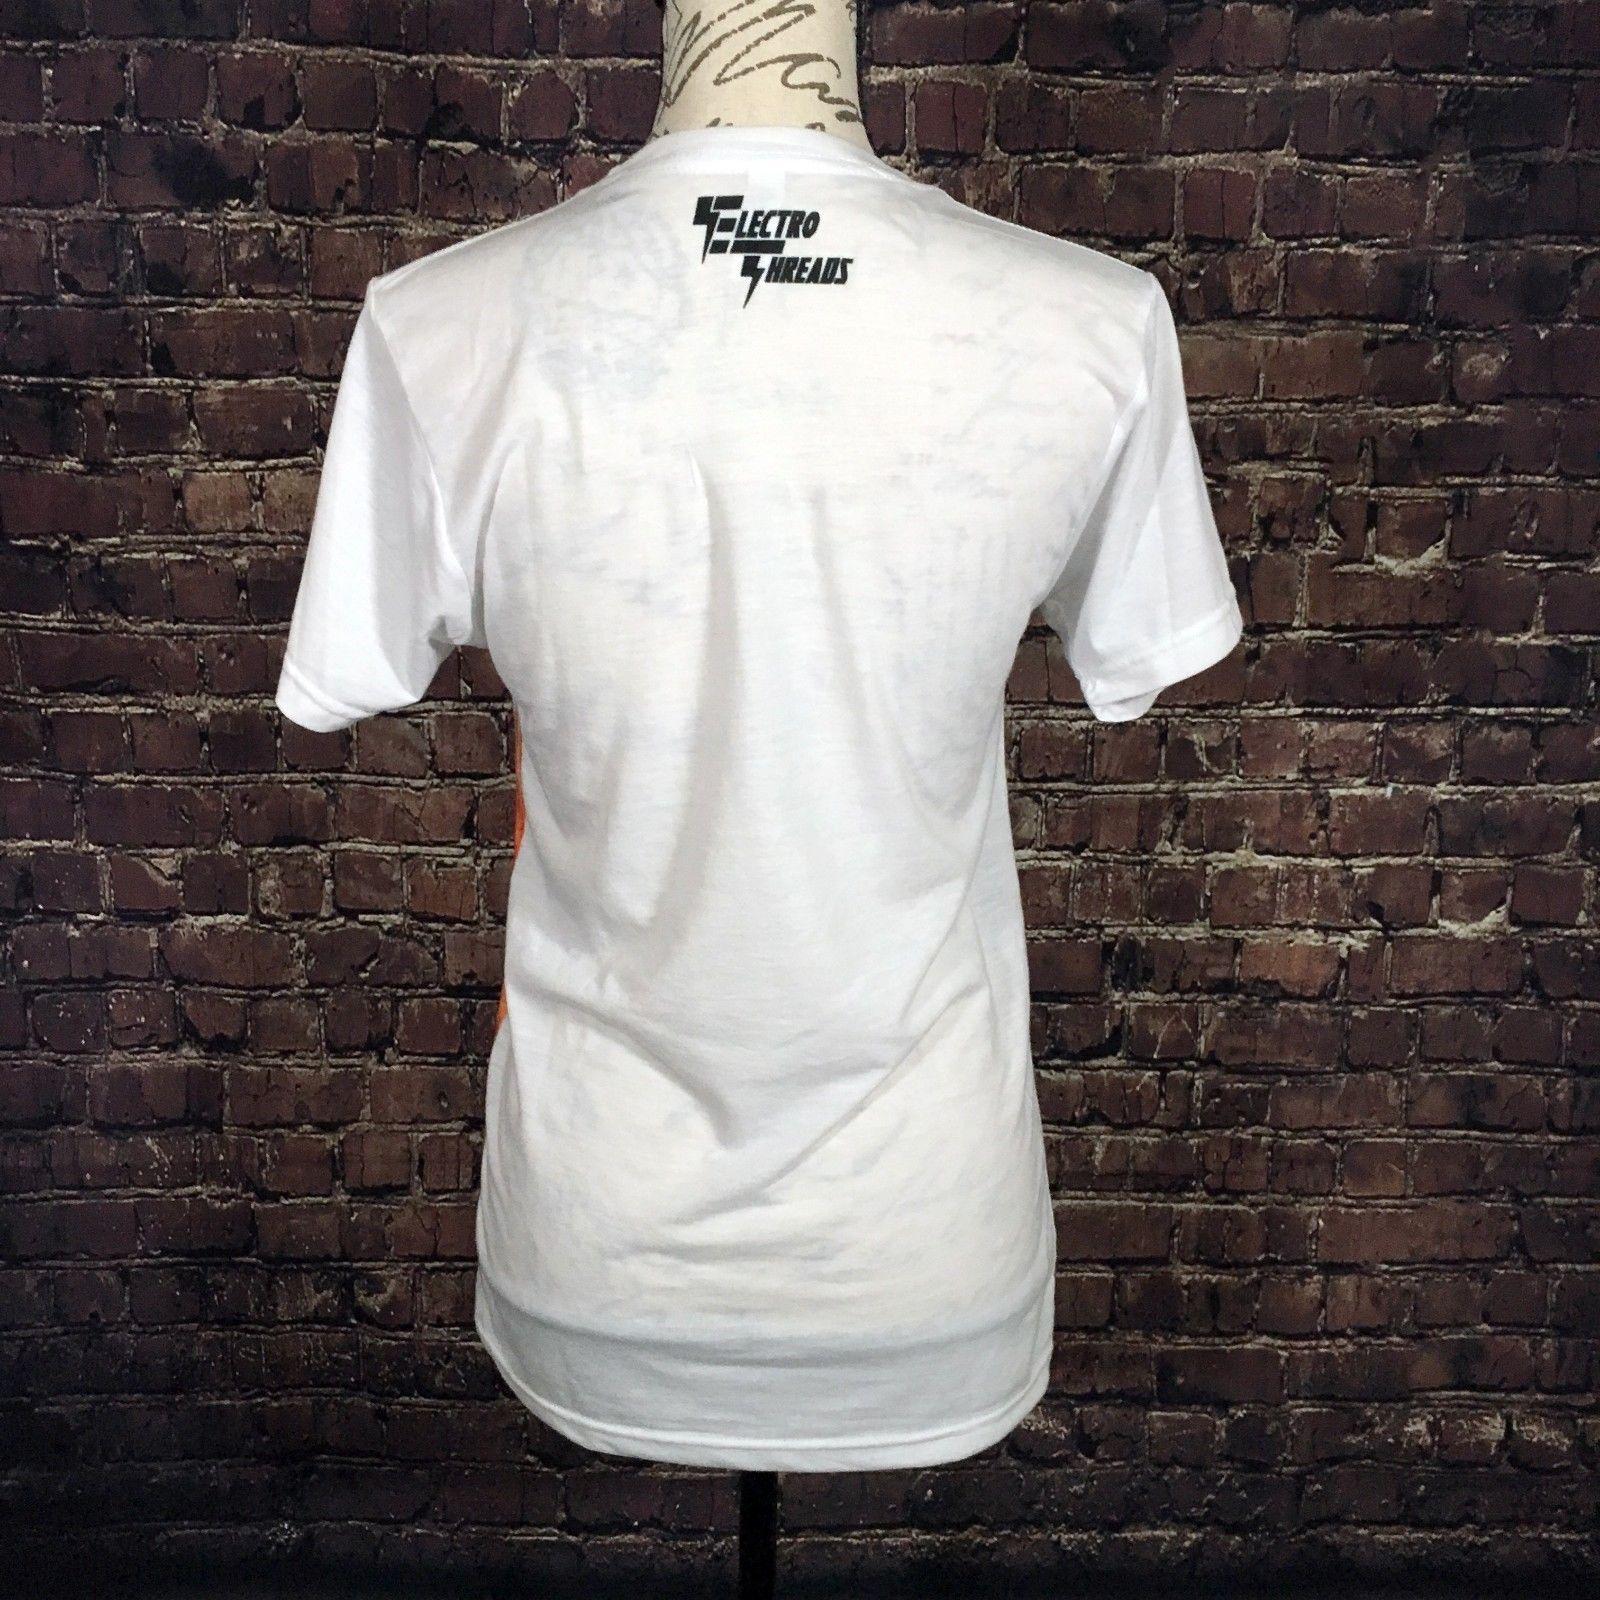 NEW Electro Threads FRIENDLY SLOTH White Unisex Crew Short Sleeve T-Shirt XSmall